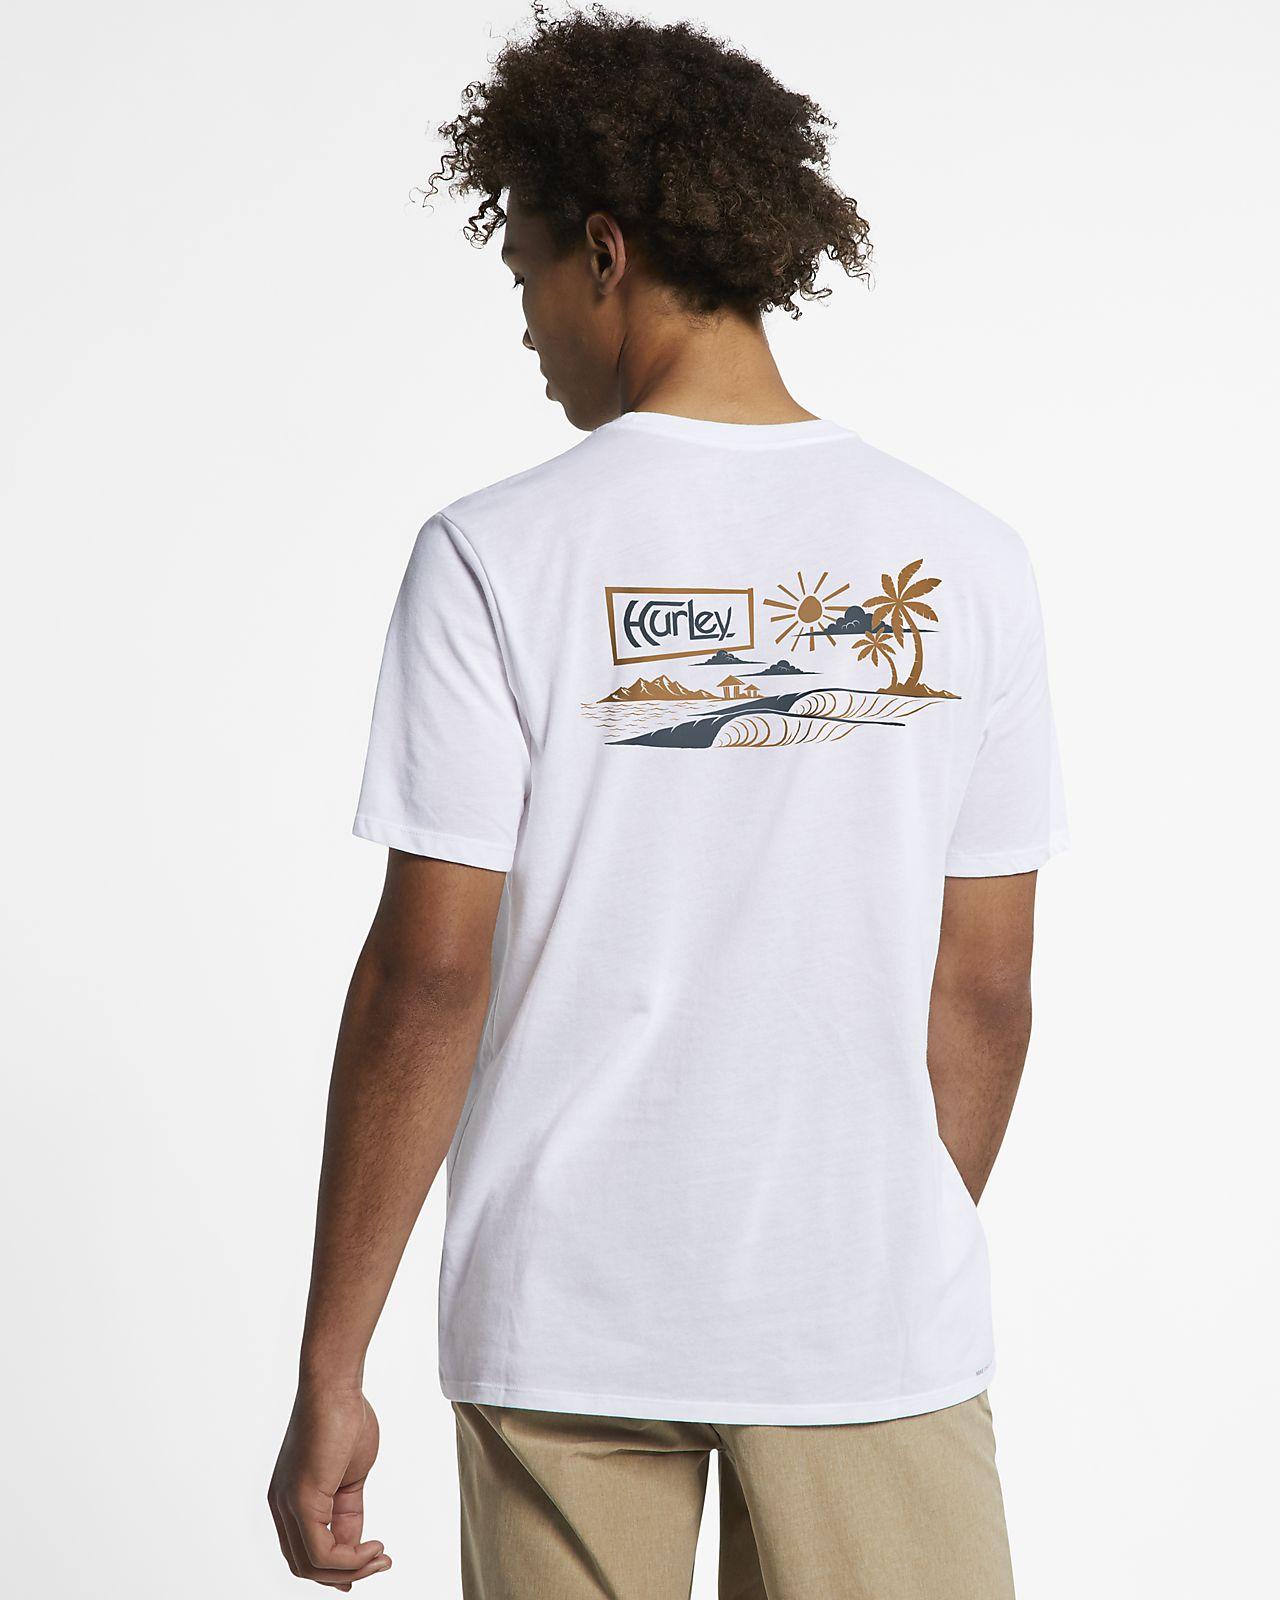 Hurley Dri-FIT Island Style Men's T-Shirt